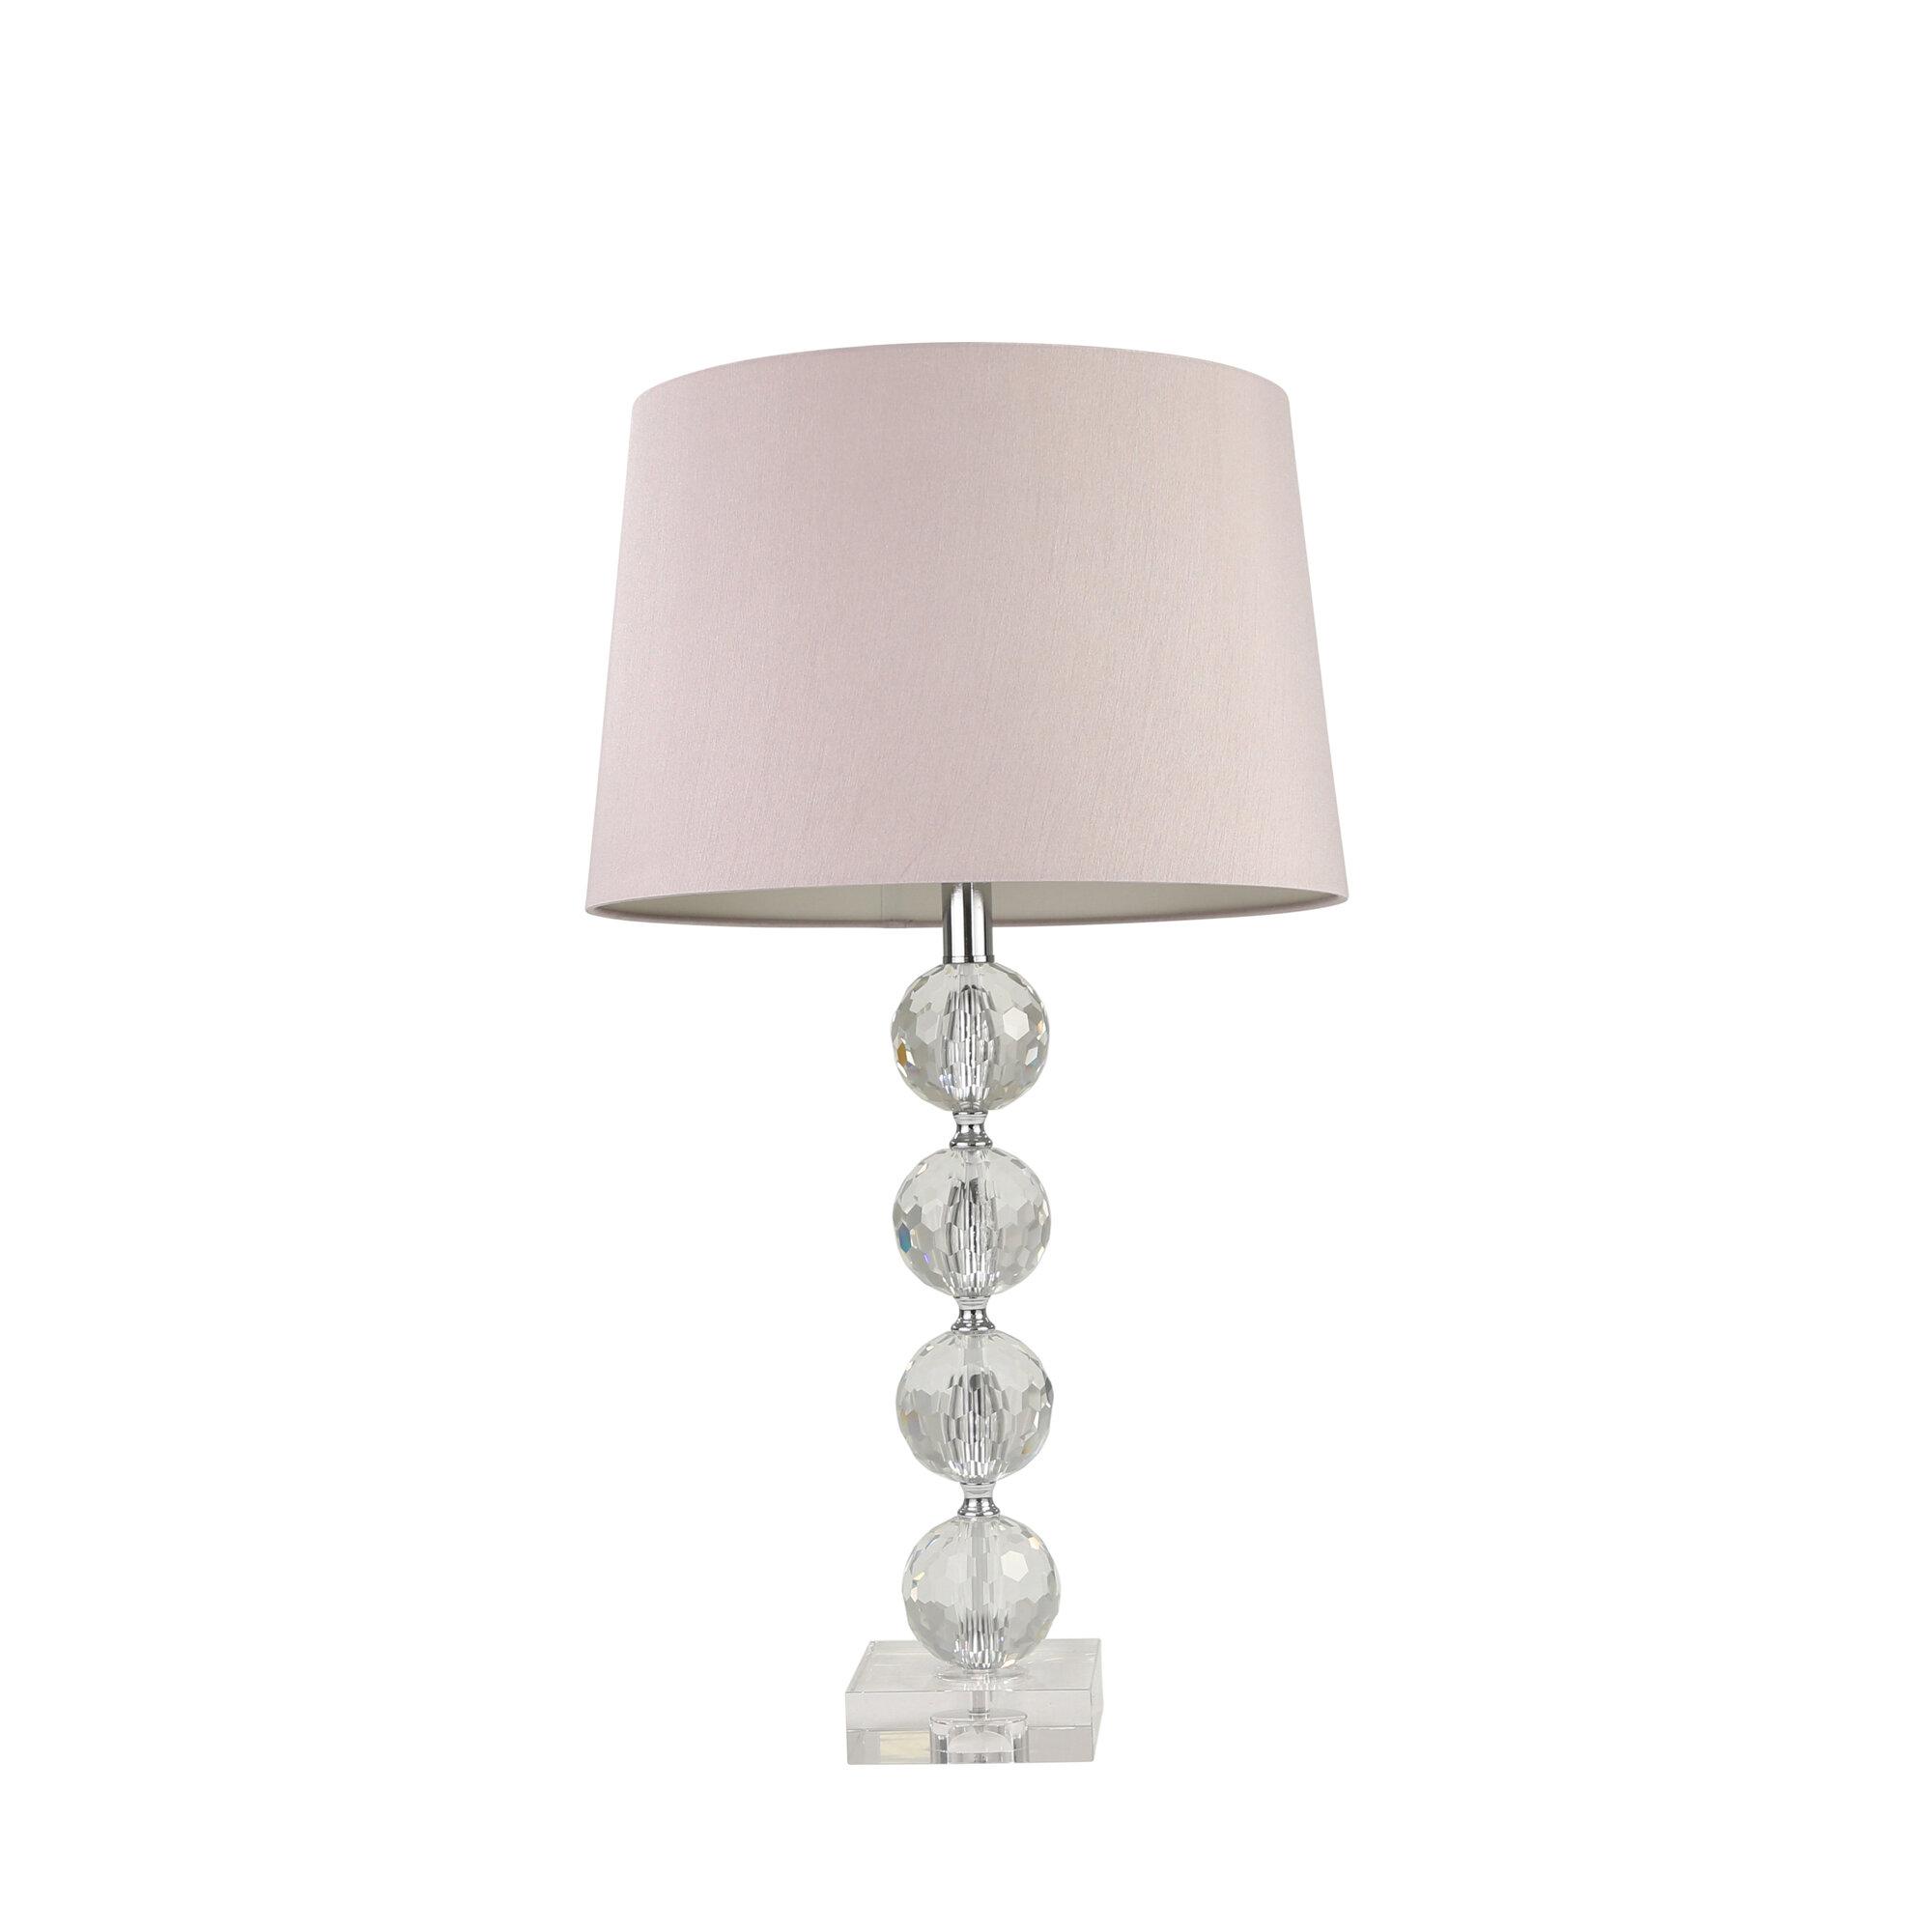 Image of: Mercer41 Niamh Glass Ball 28 Table Lamp Wayfair